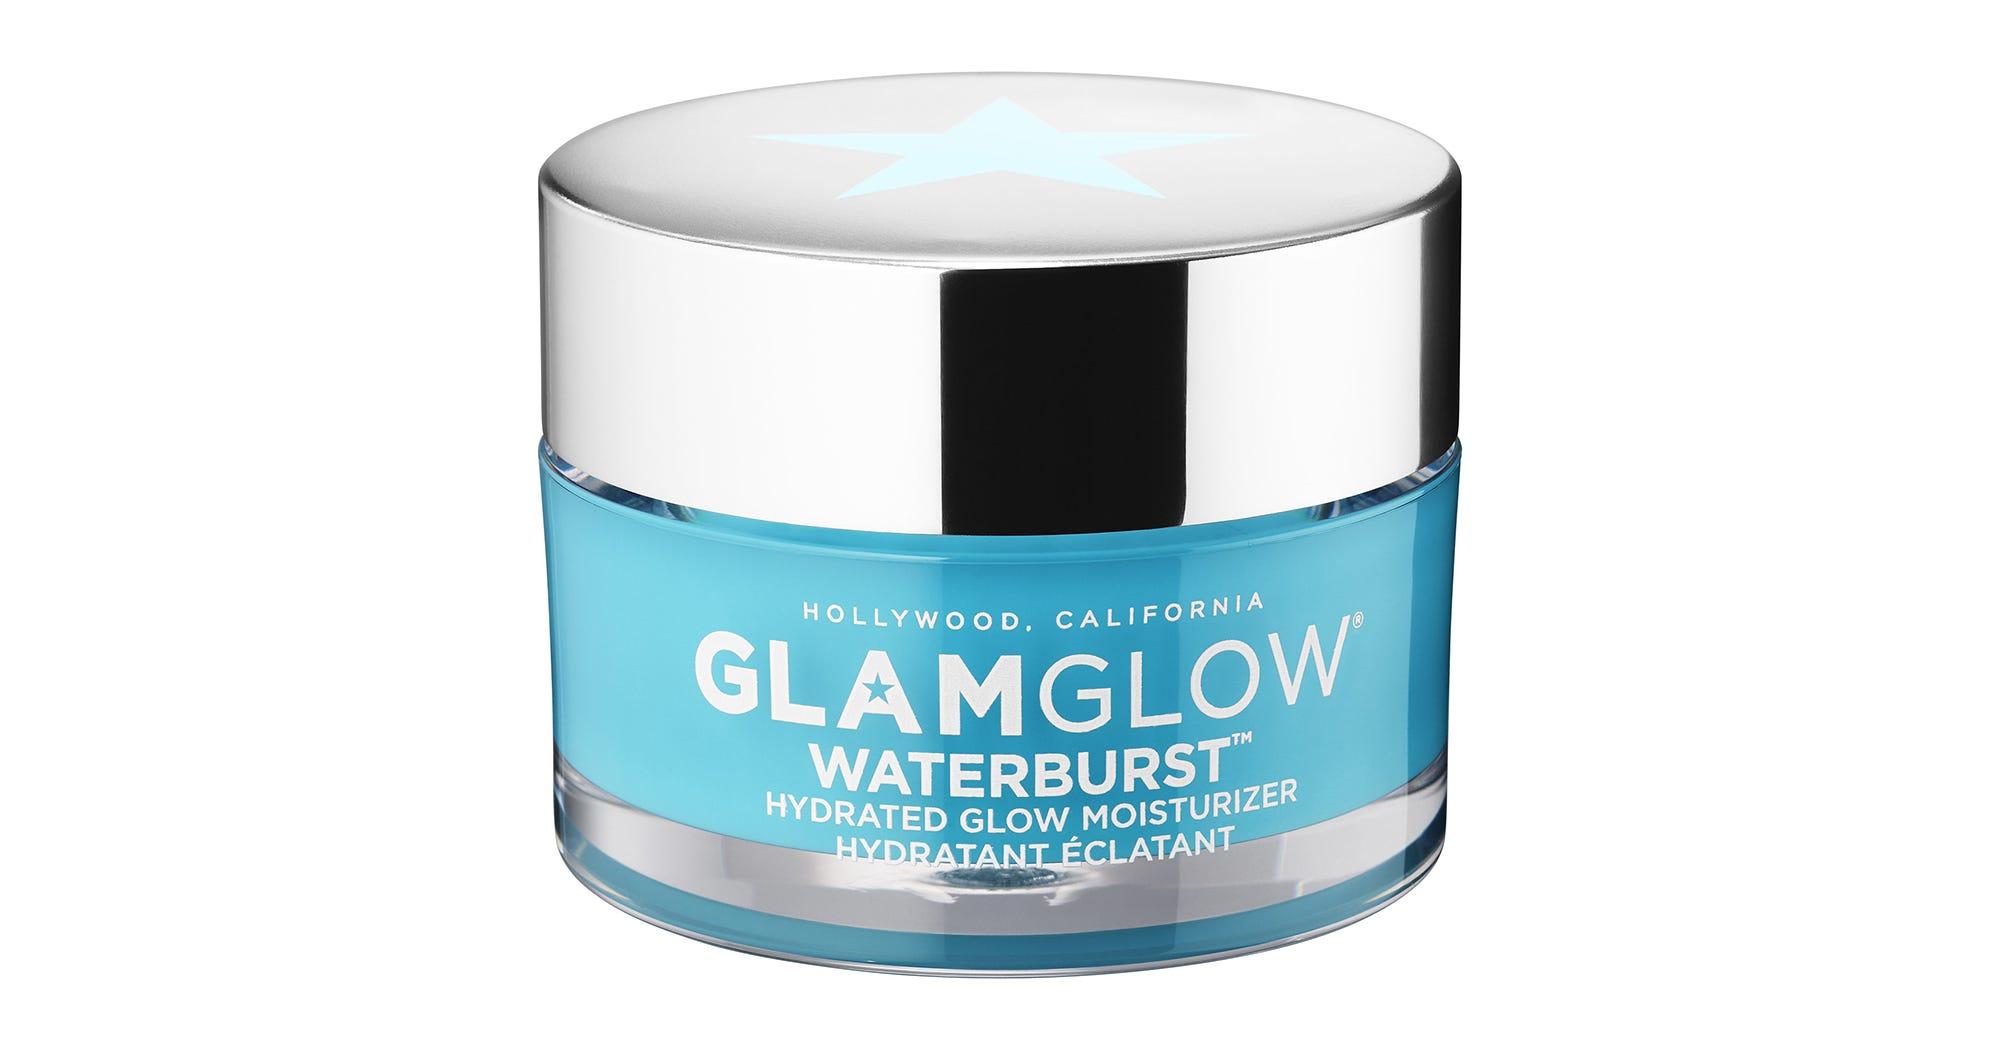 Water-Gel Skin Care Is Almost As Essential As Actual Water